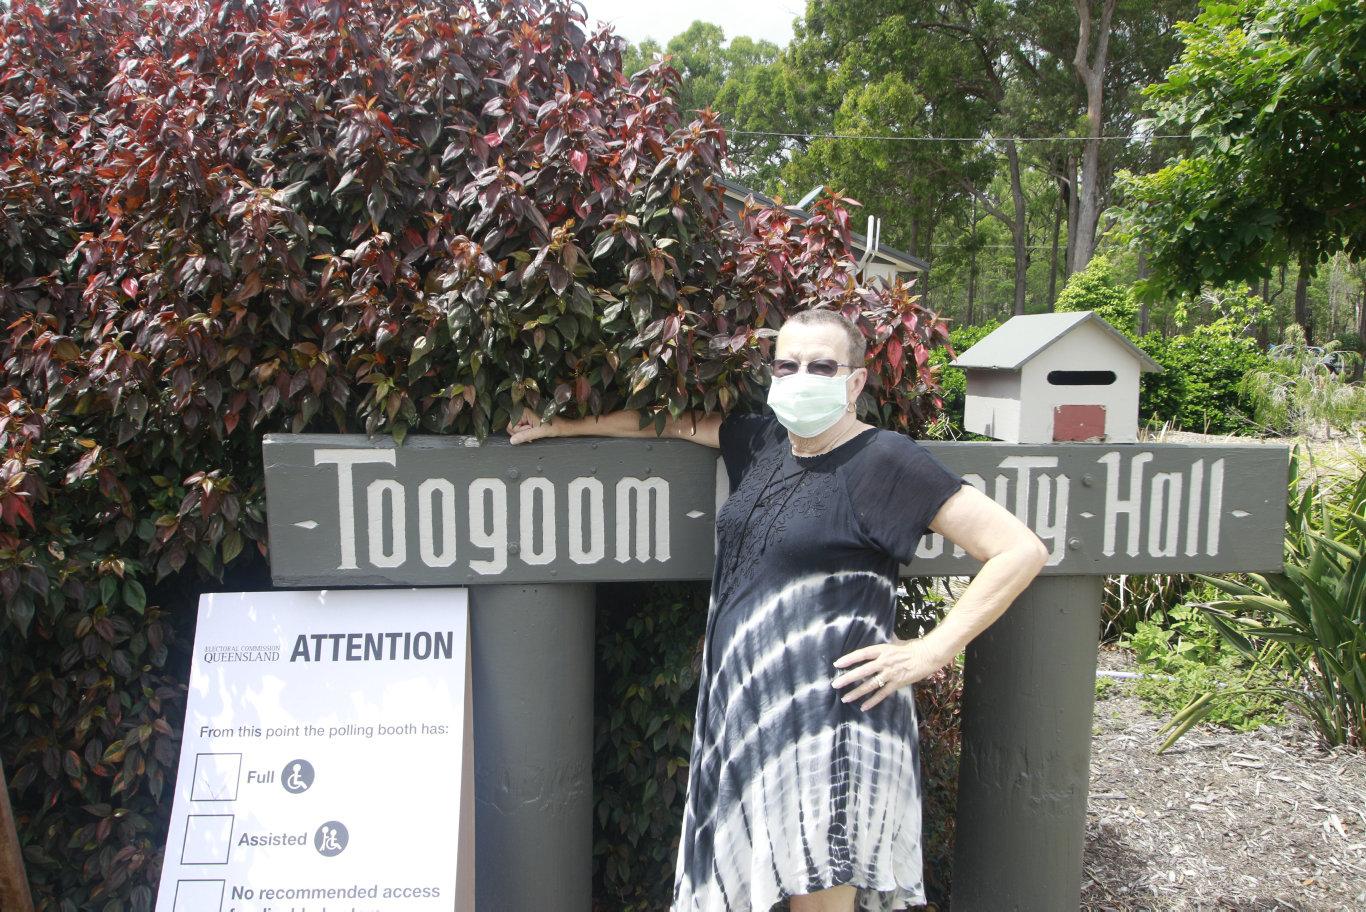 Celeste Giess at the Toogoom Community Hall